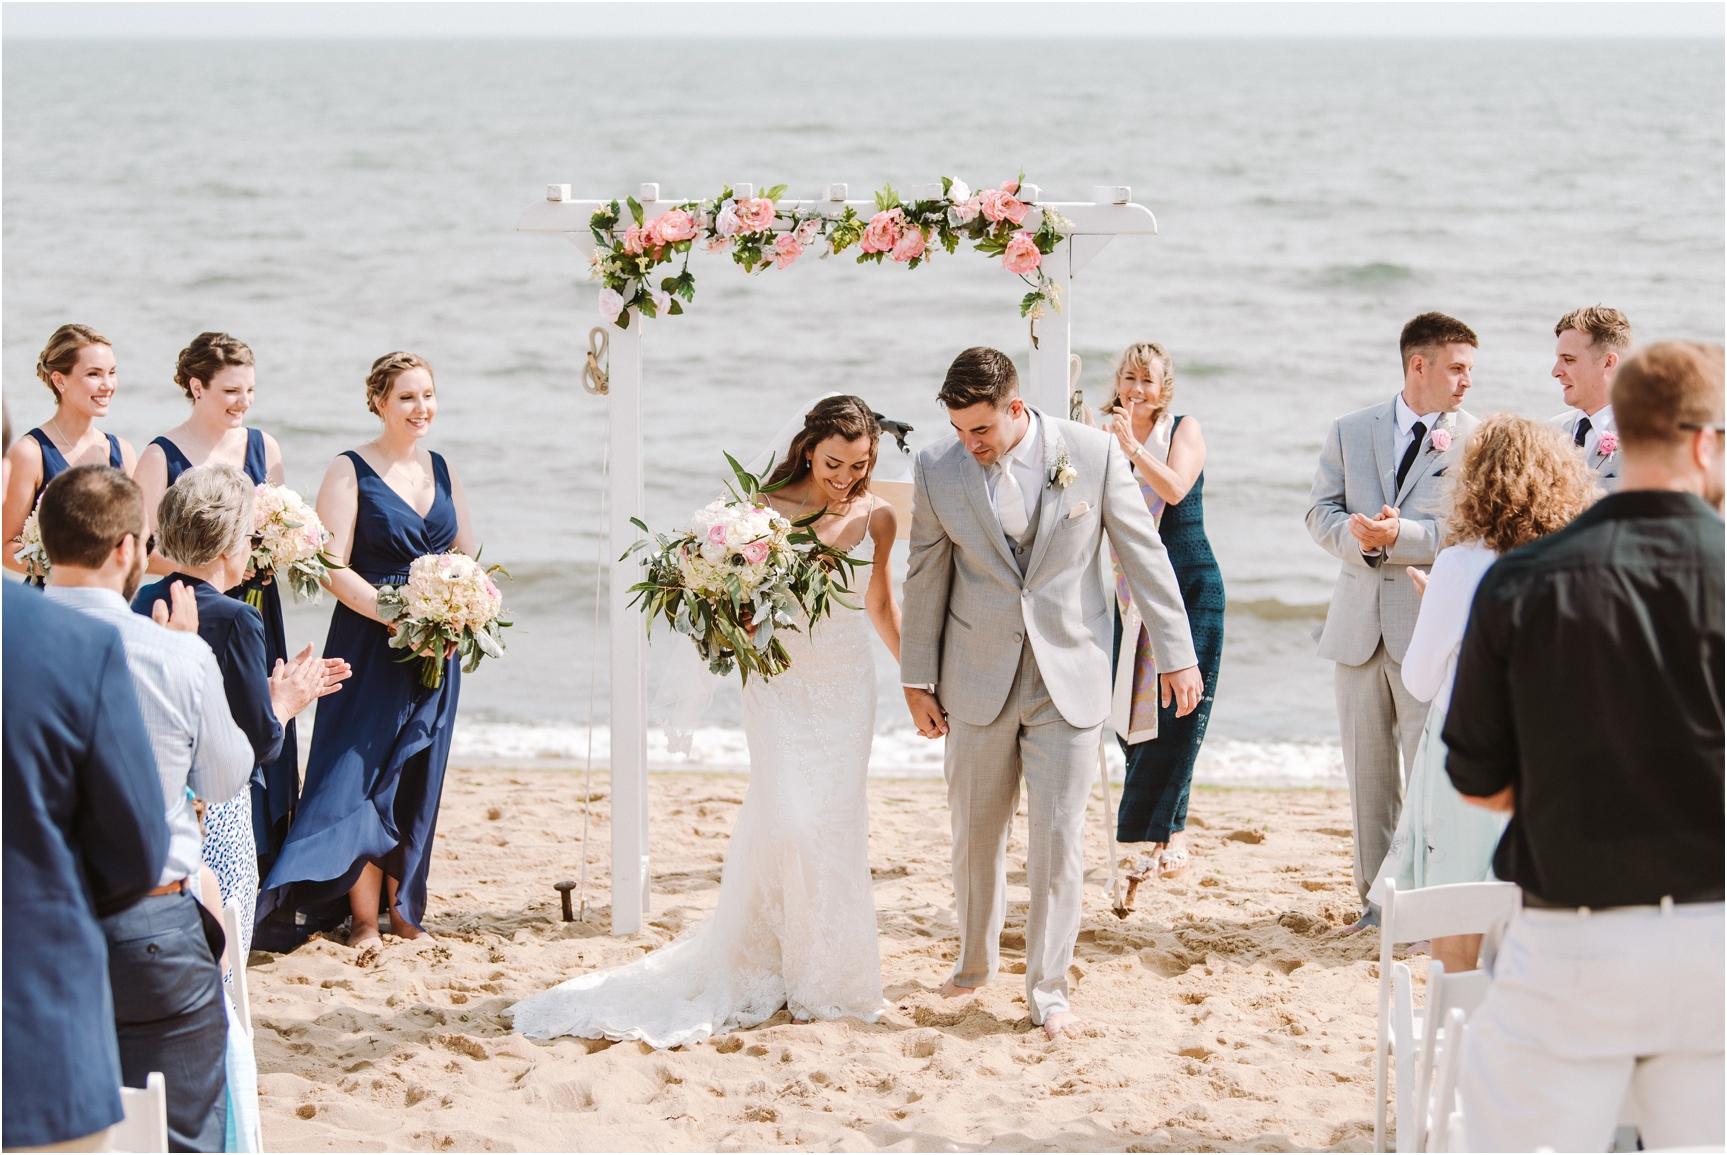 Sarah & Sam Pelham House Cape Cod Wedding Photographer-115.jpg